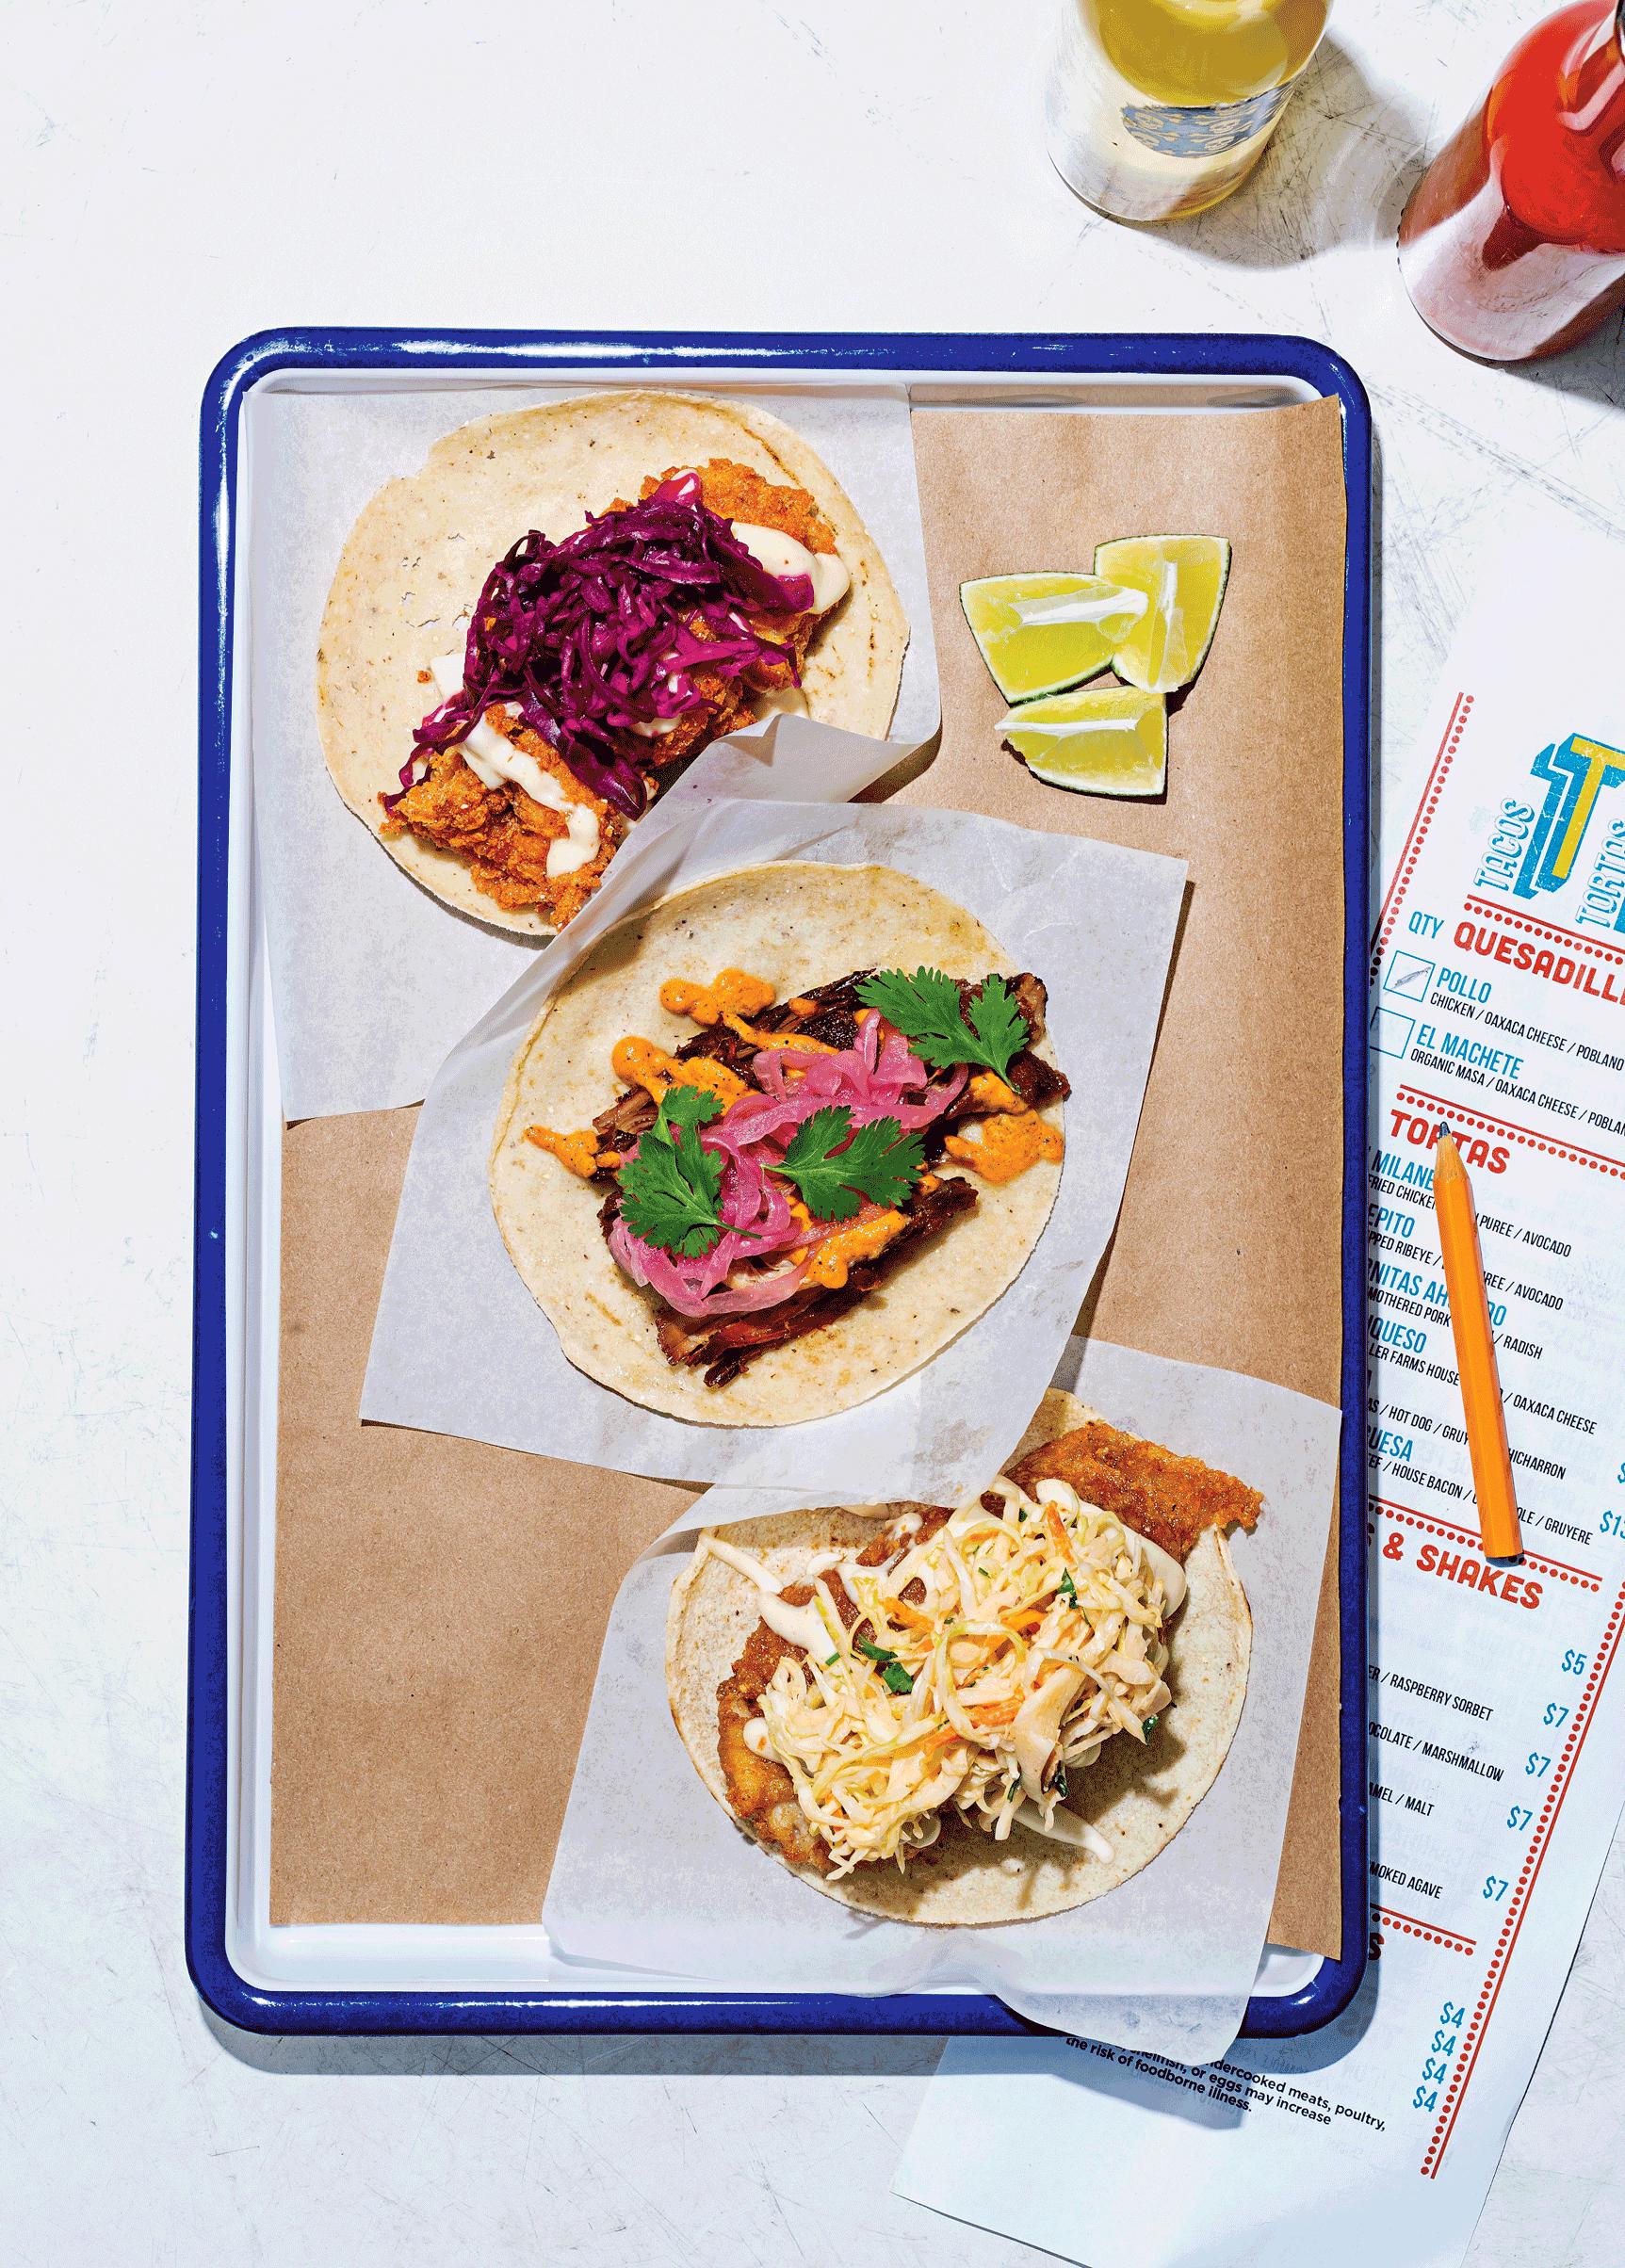 The 17 Best New Mexican Restaurants Around DC